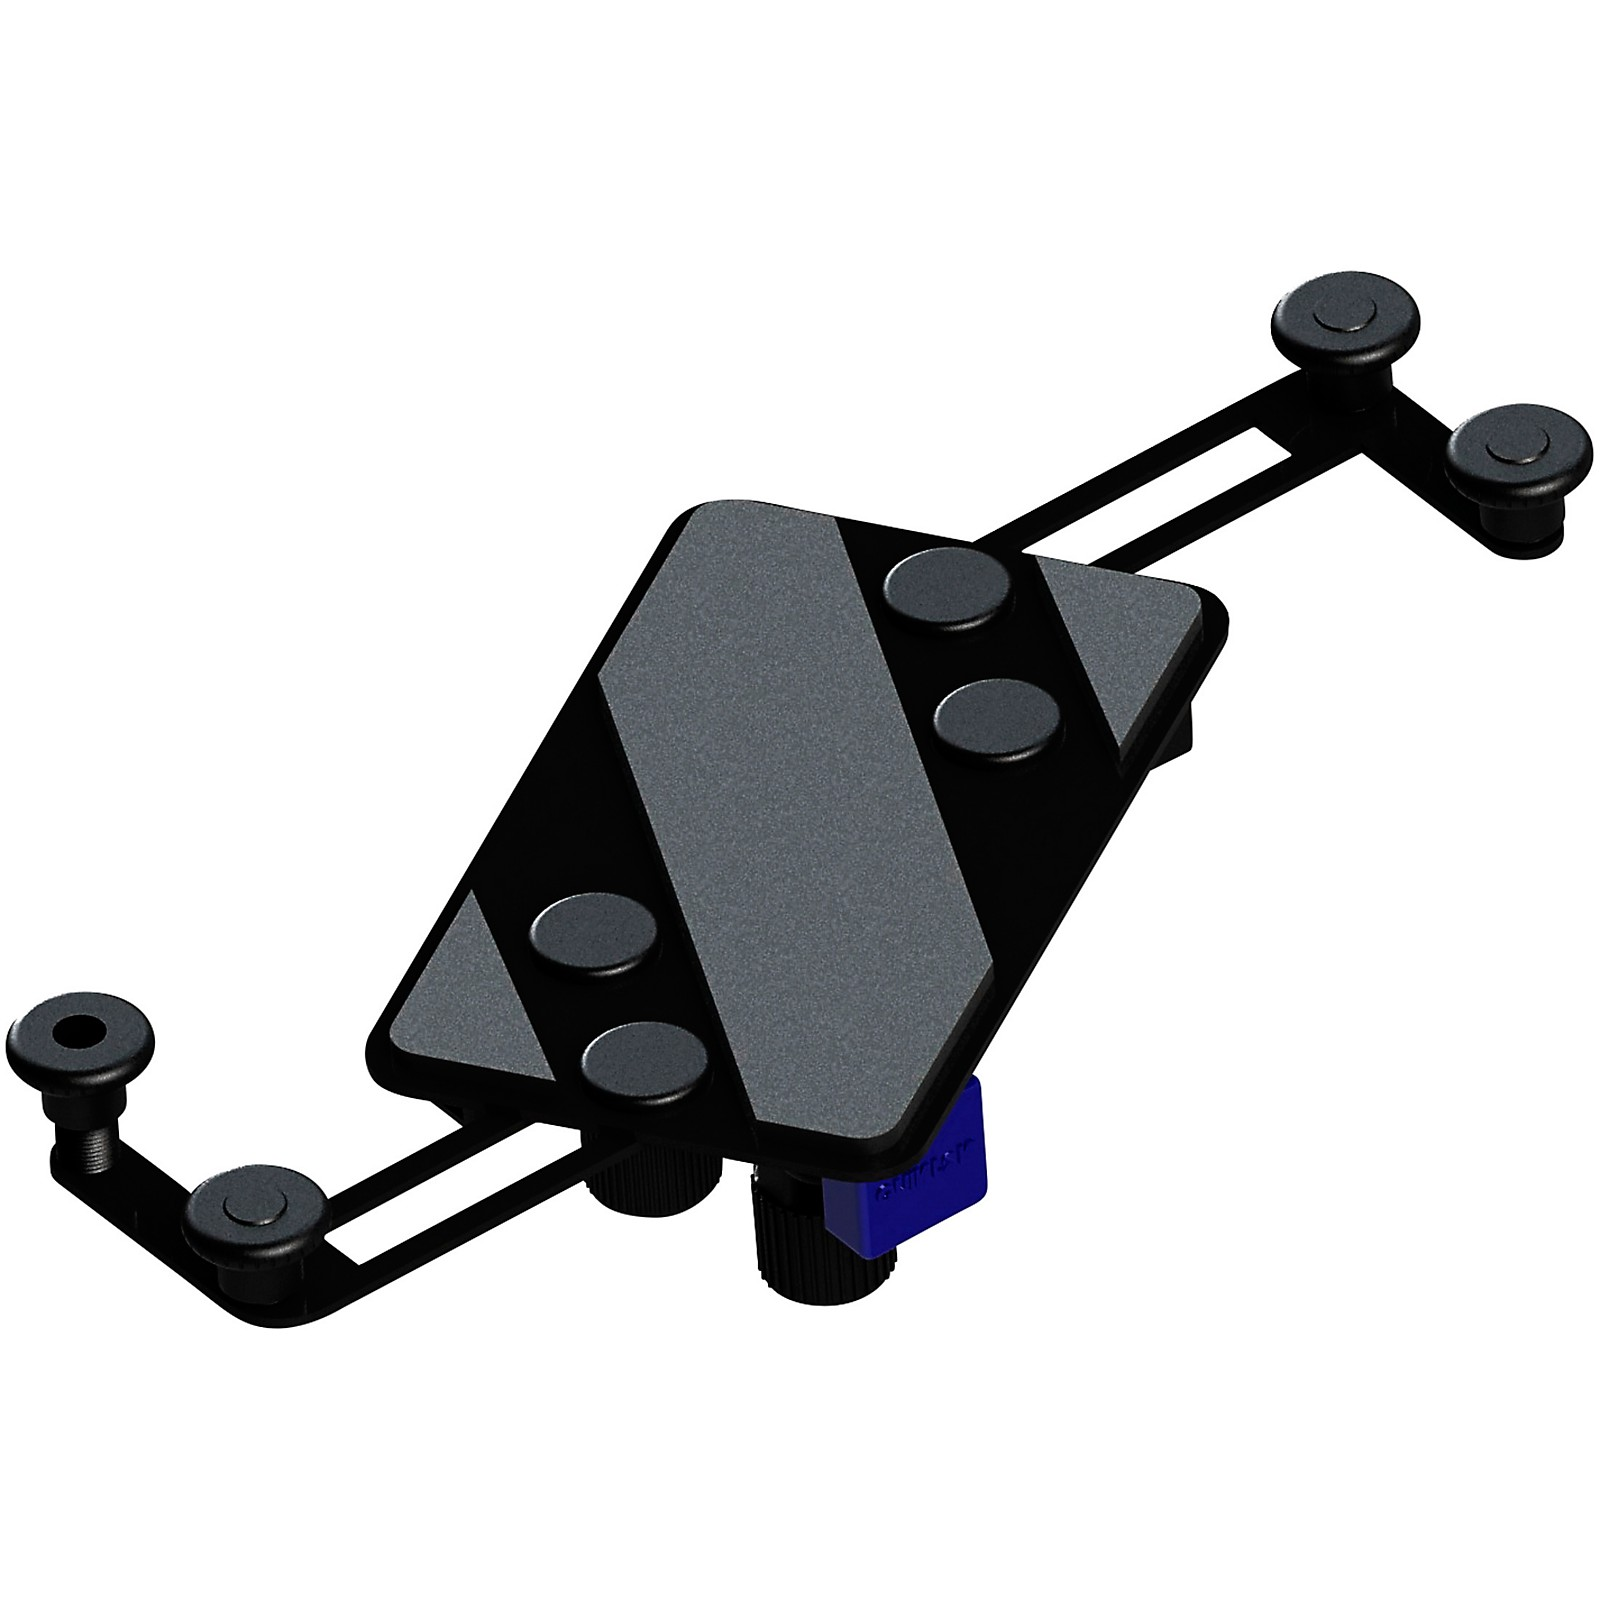 Quik-Lok Universal Tablet Holder for Side/Top Connection